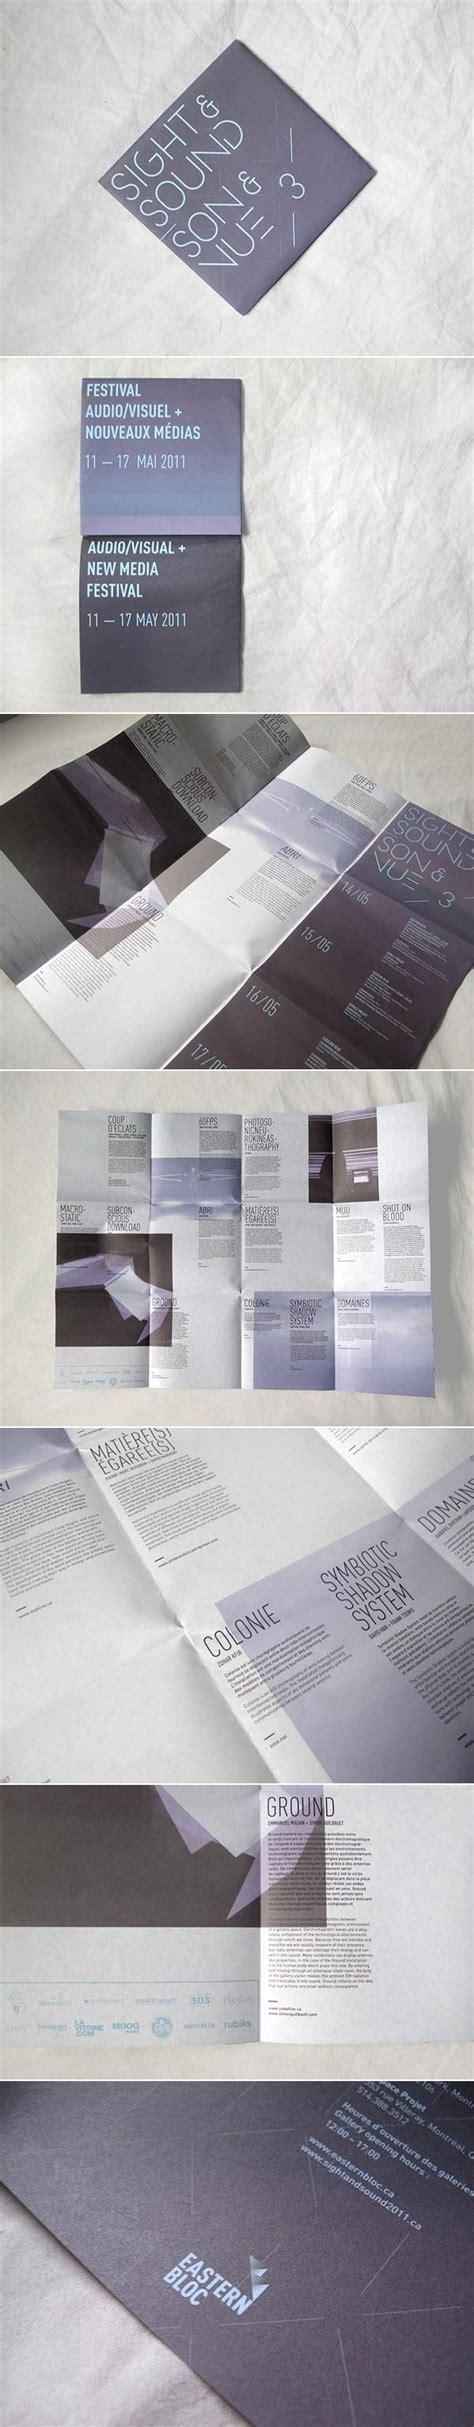 9 Stylish Folder Brochure Folds For Print Designers Best 25 Brochure Folds Ideas On Brochure